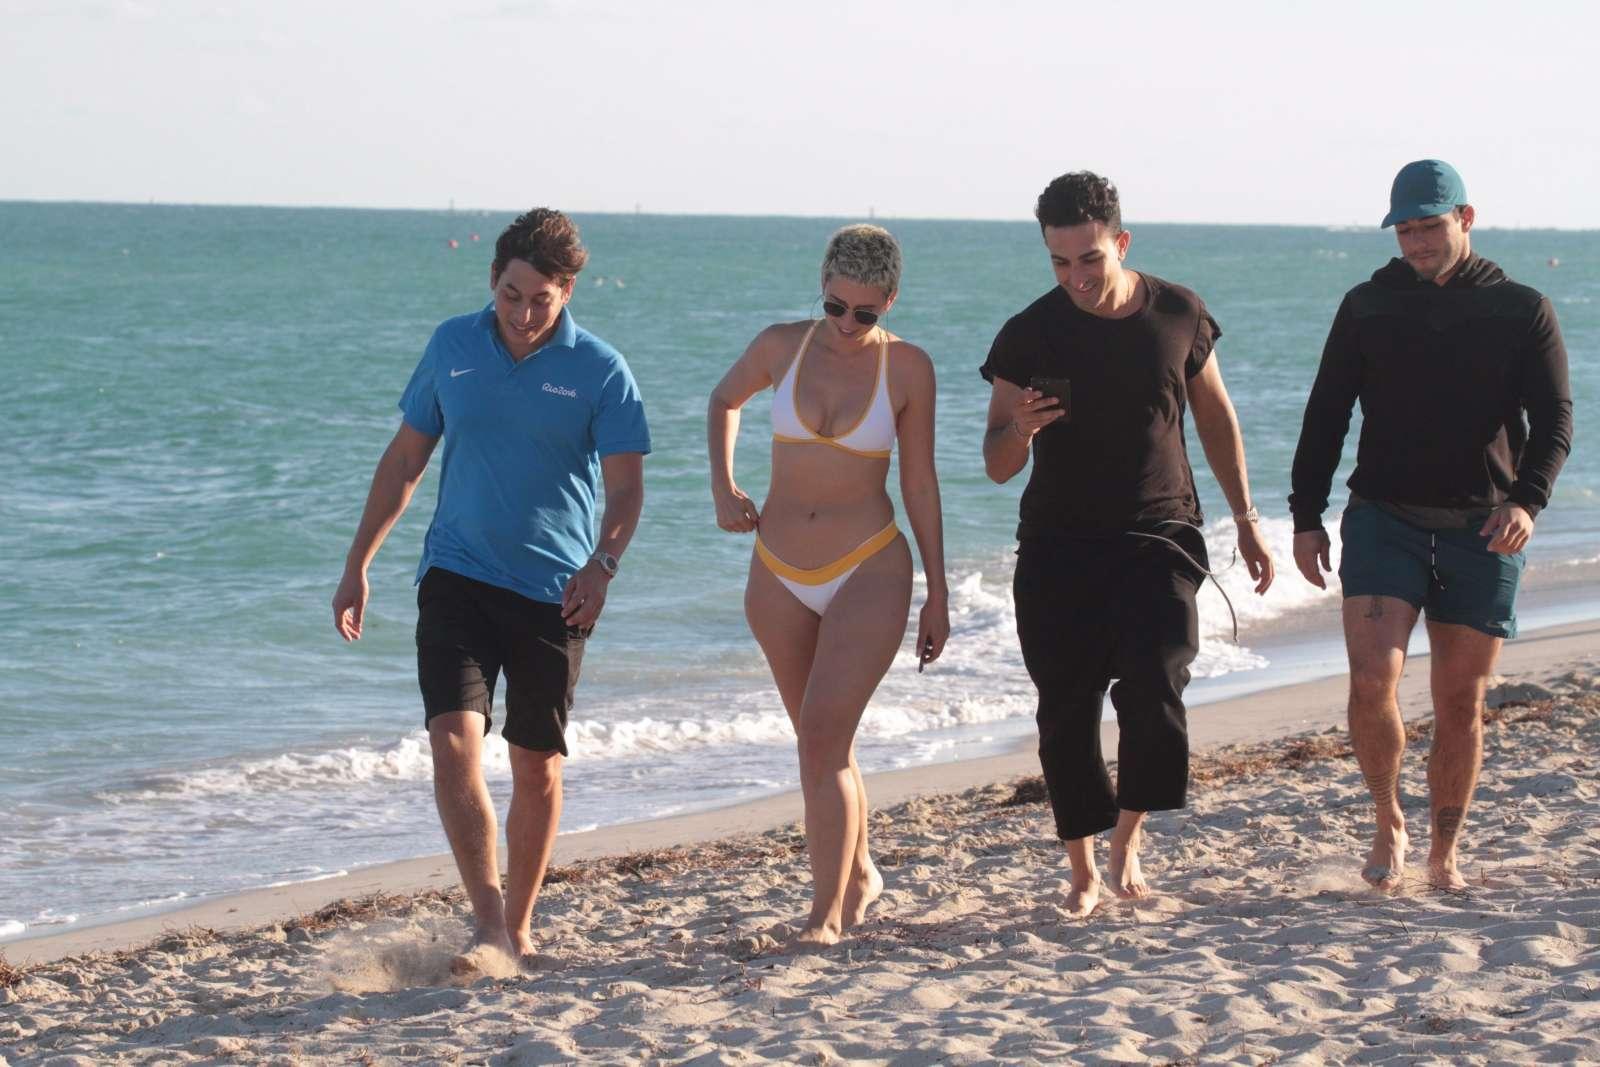 YesJulz in White Bikini on the beach in Miami Pic 5 of 35